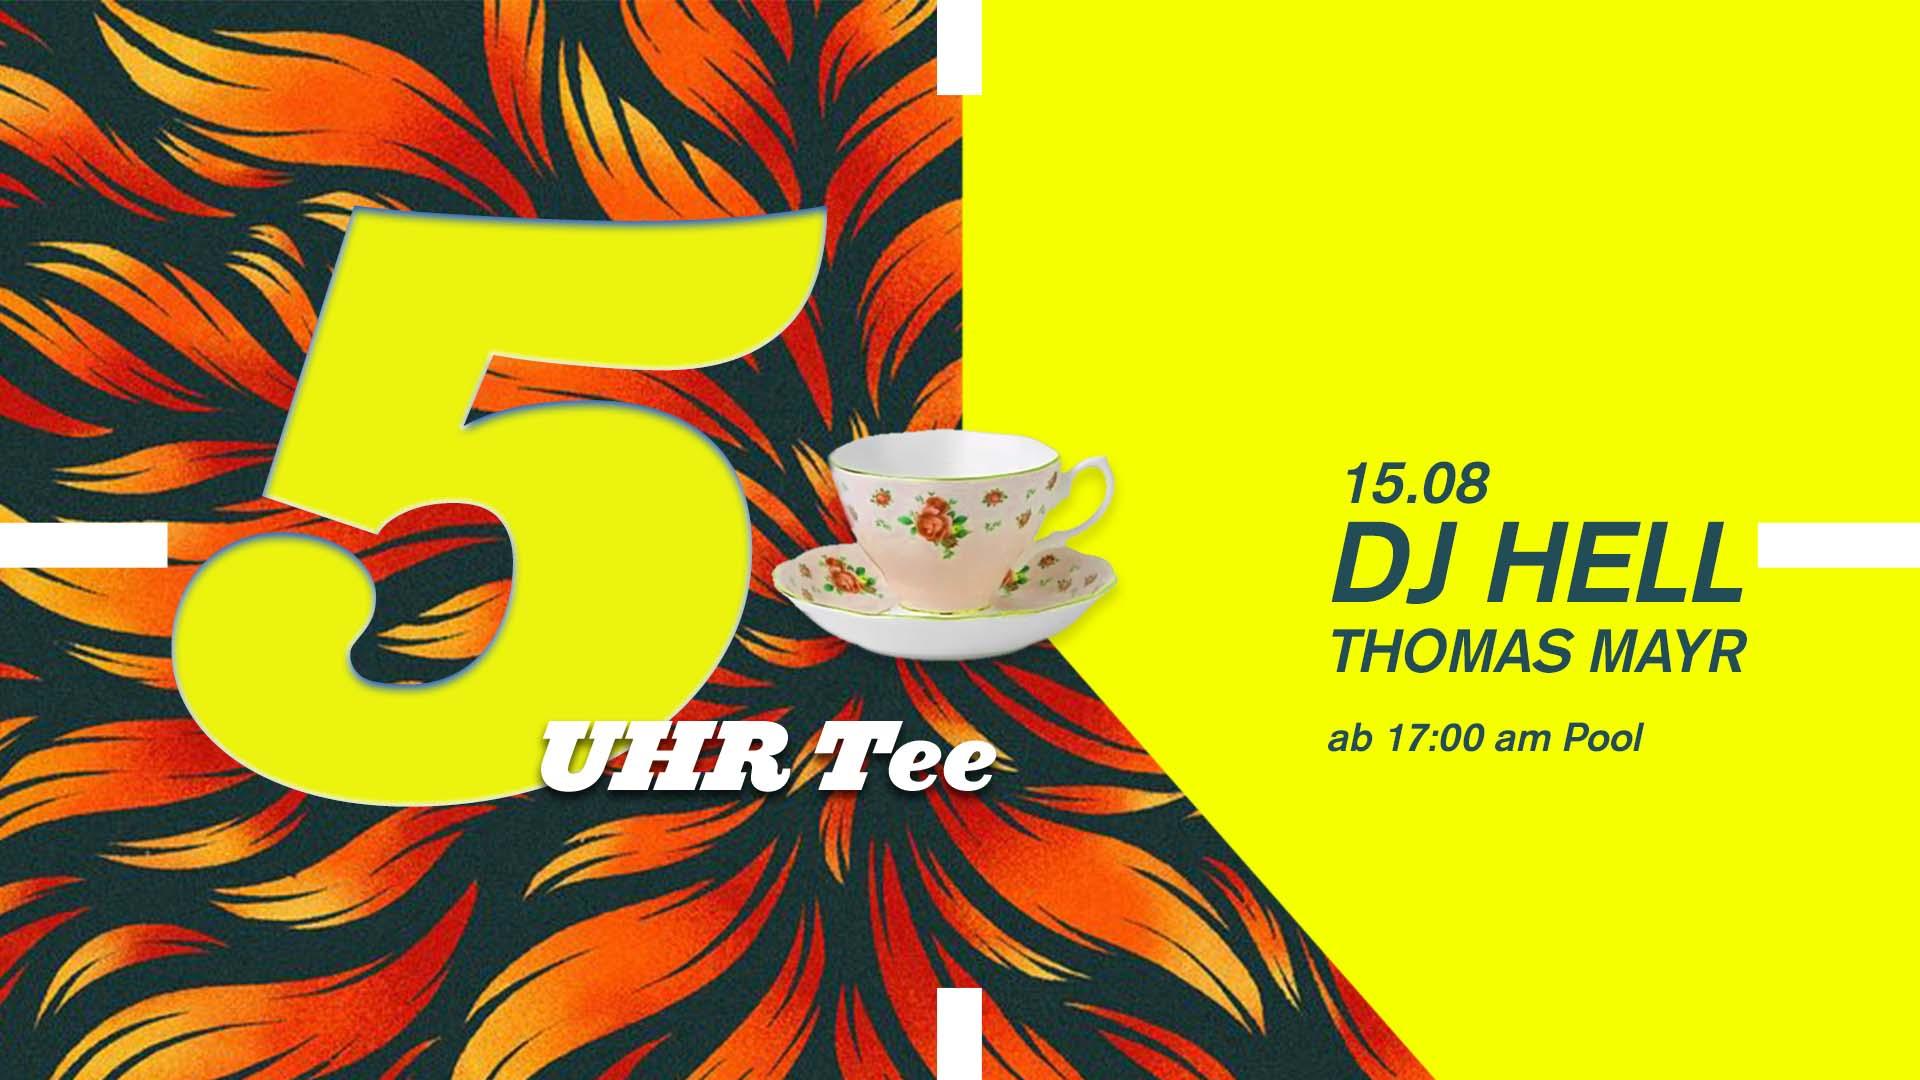 Events Wien: 5 Uhr Tee Spezial mit DJ Hell